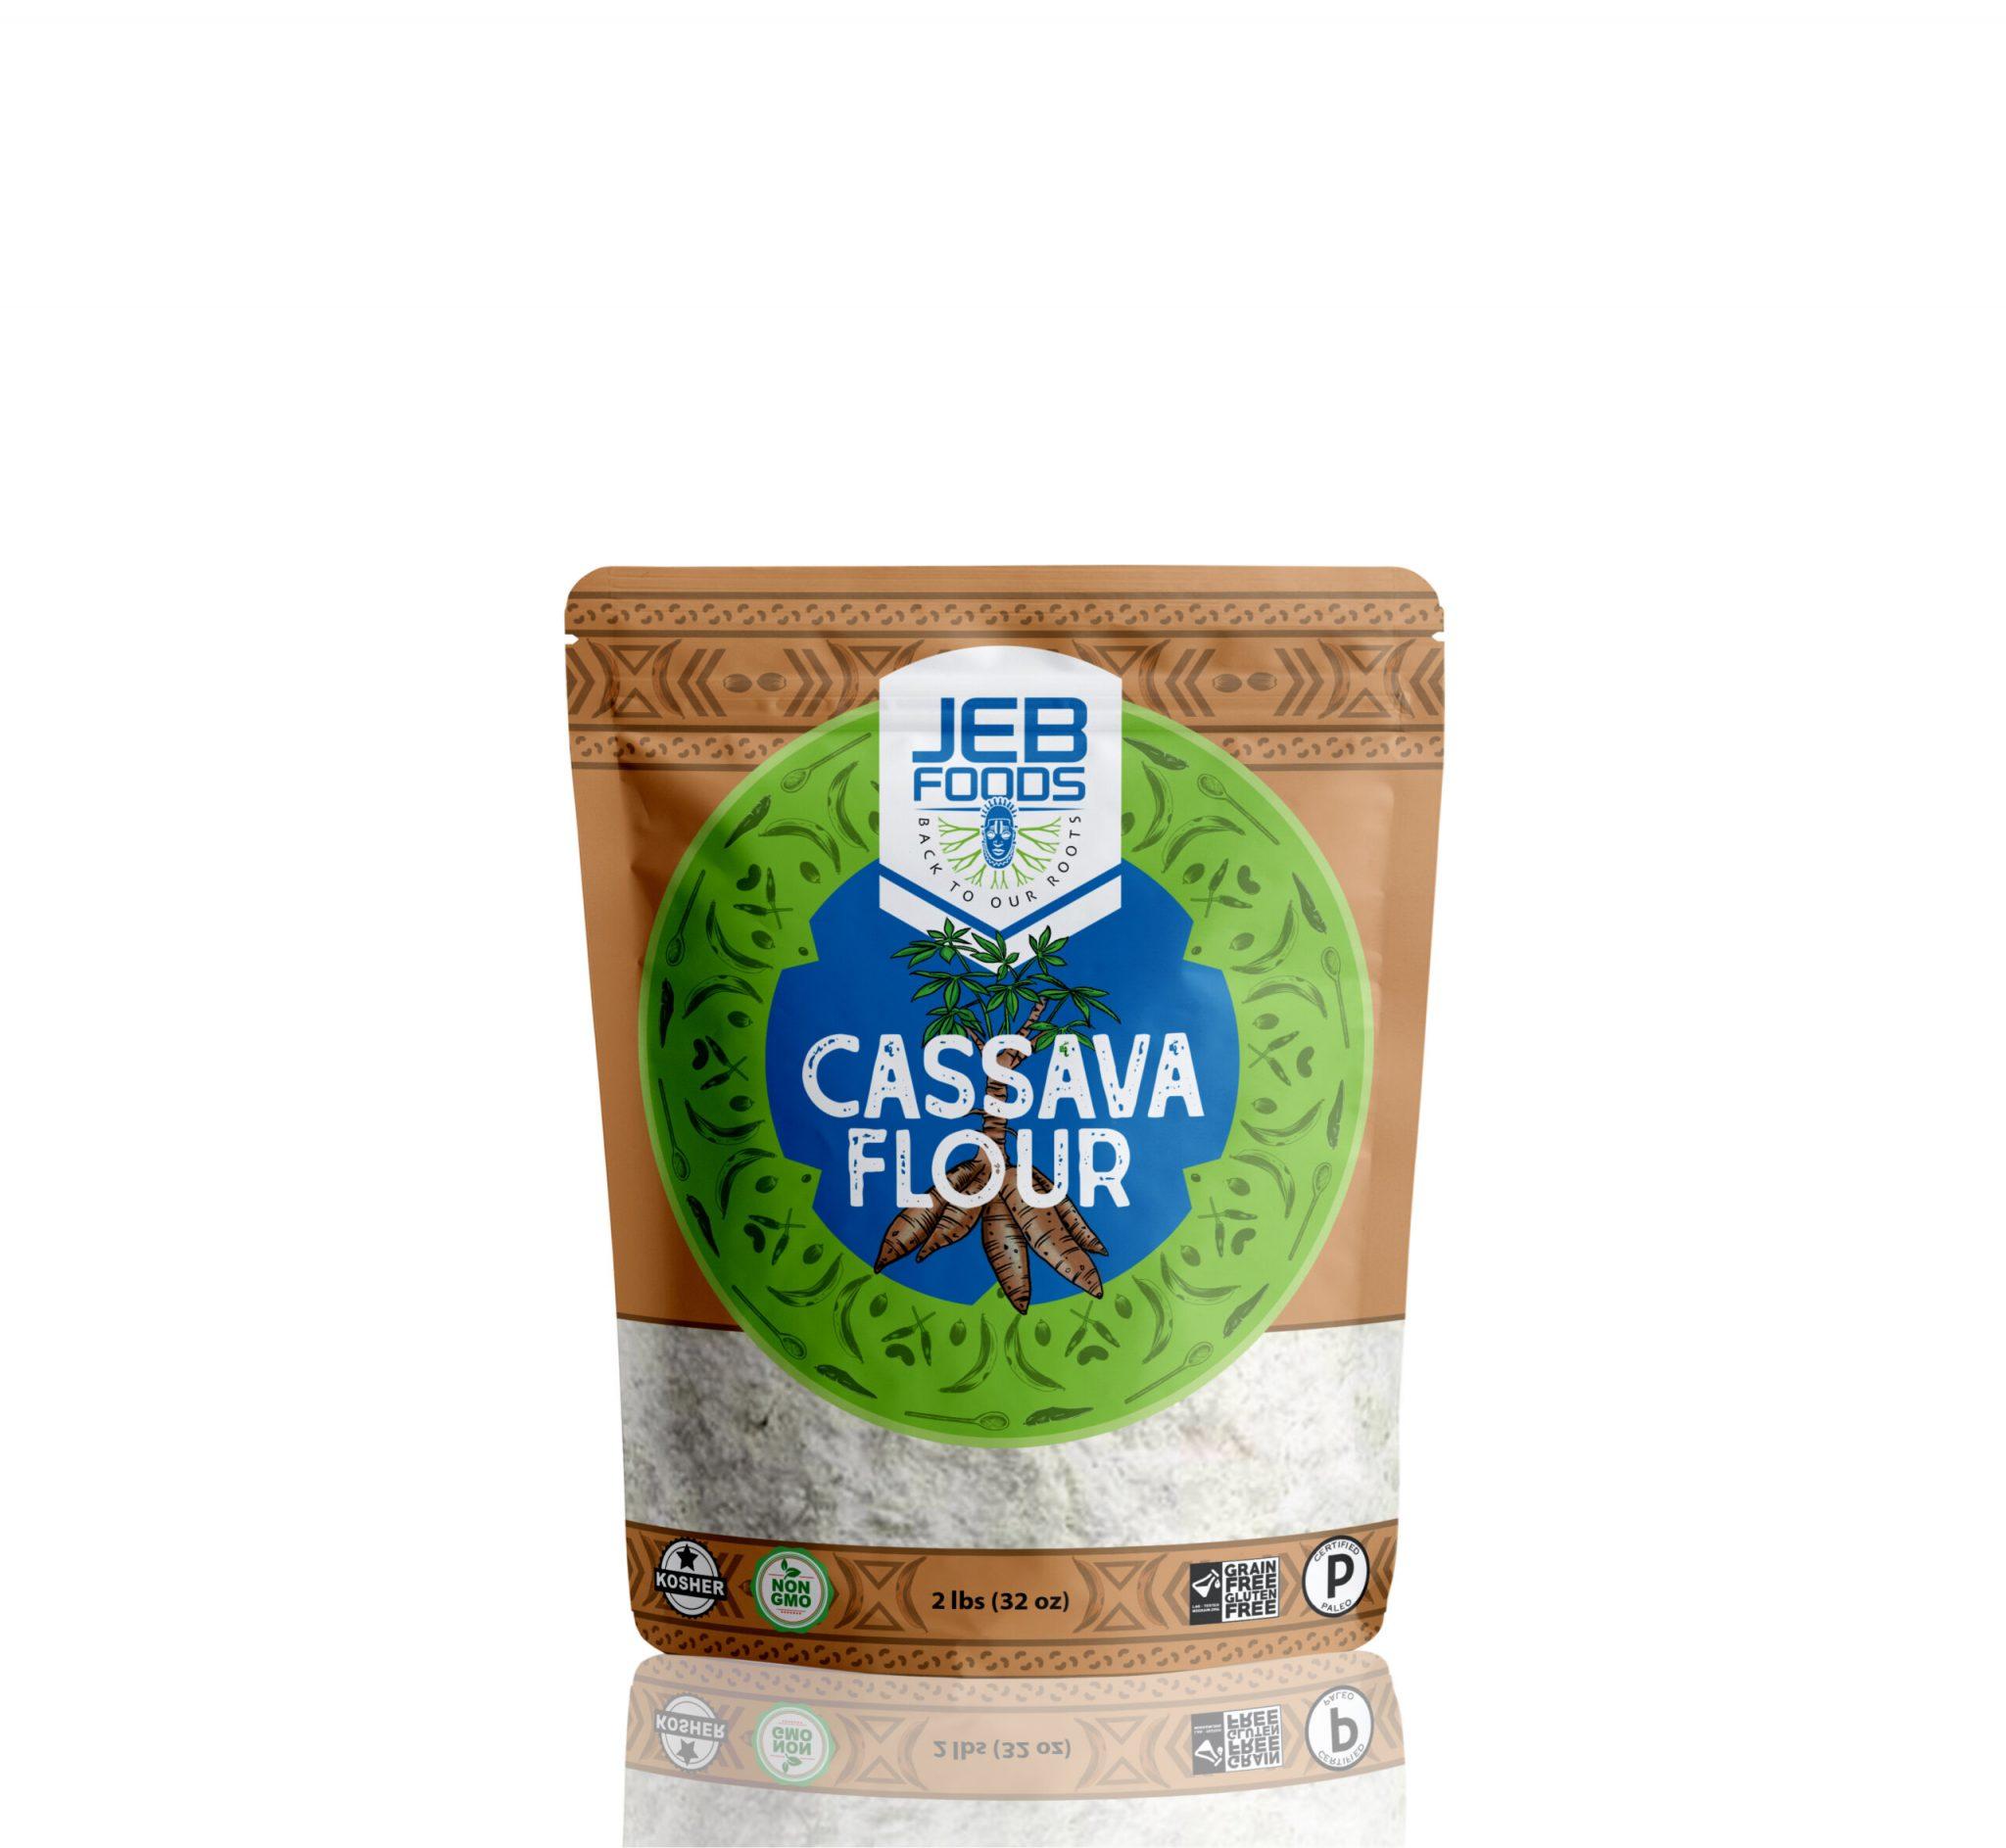 Cassava Flour - Jeb Foods - Grain Free Certified Paleo Keto Certified by the Paleo Foundation